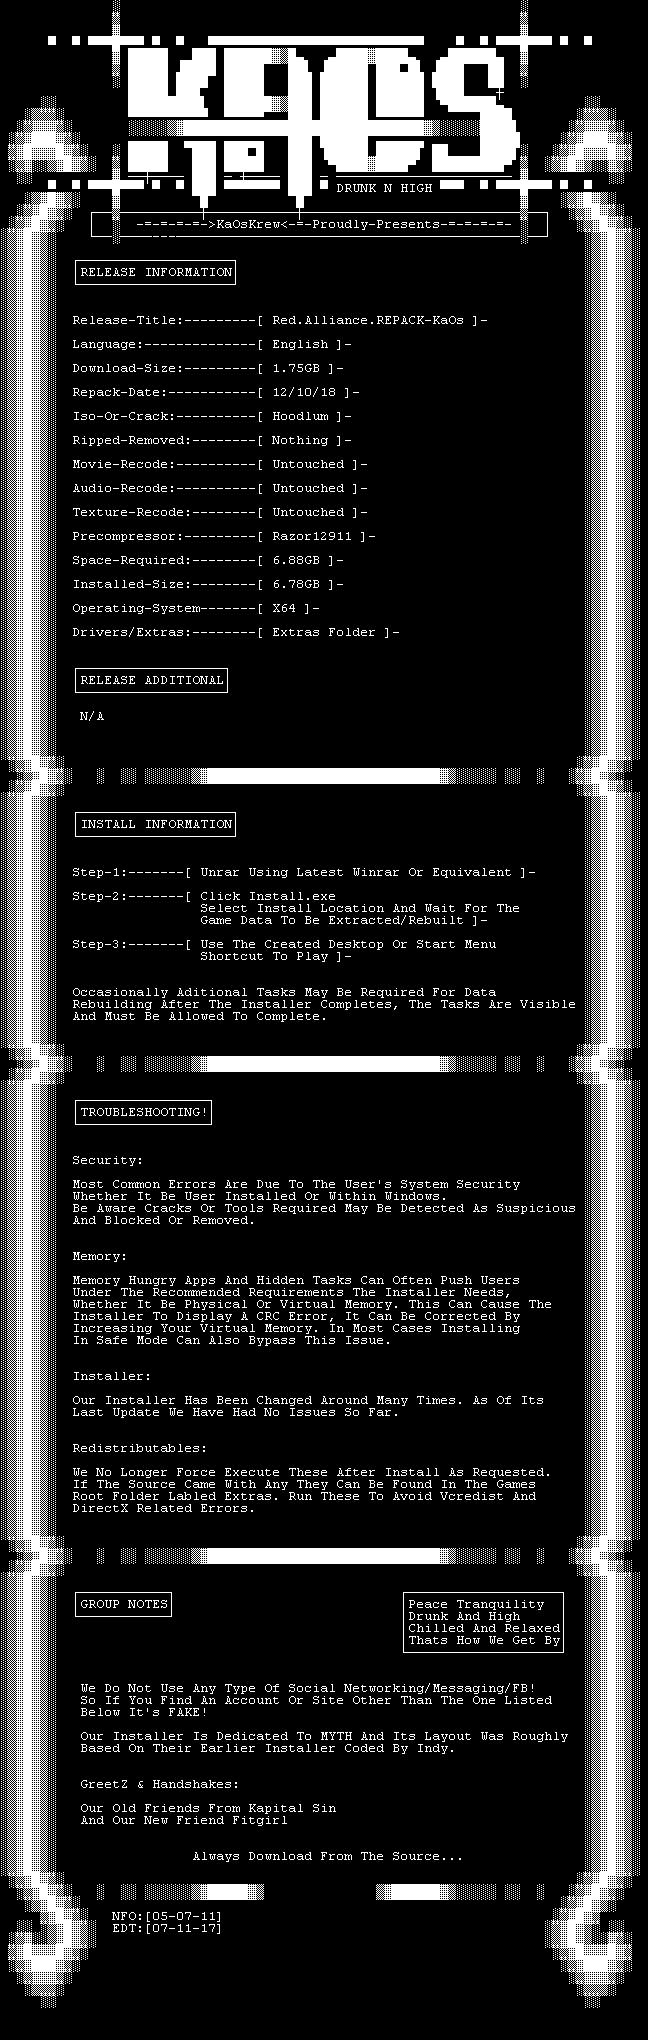 Download Red.Alliance.REPACK-KaOs Torrent